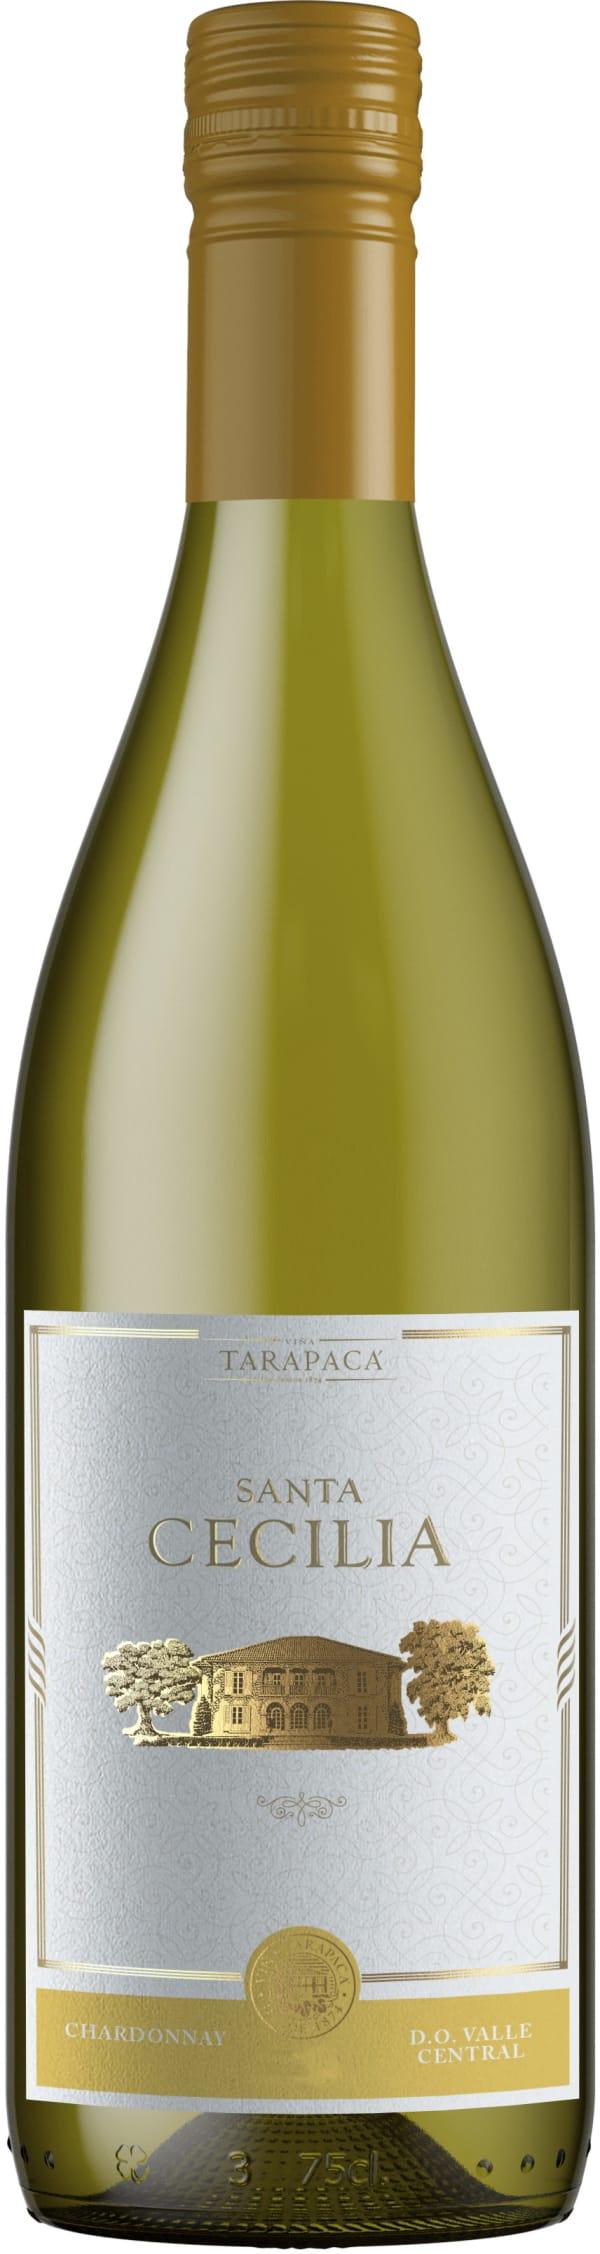 Tarapacá Santa Cecilia Chardonnay 2016